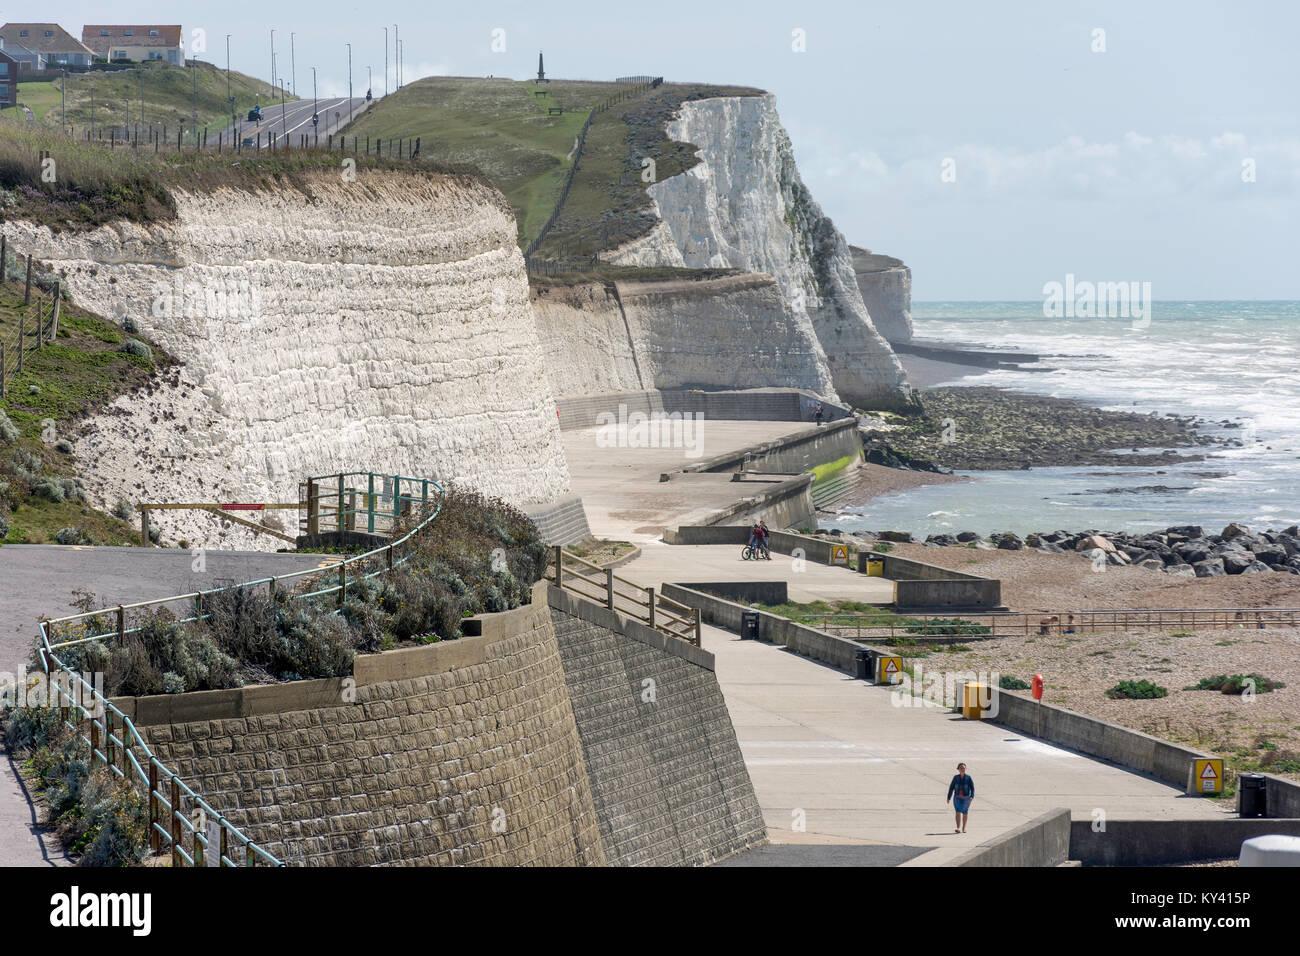 Beach promenade and Undercliff Walk, Saltdean, East Sussex, England, United Kingdom - Stock Image